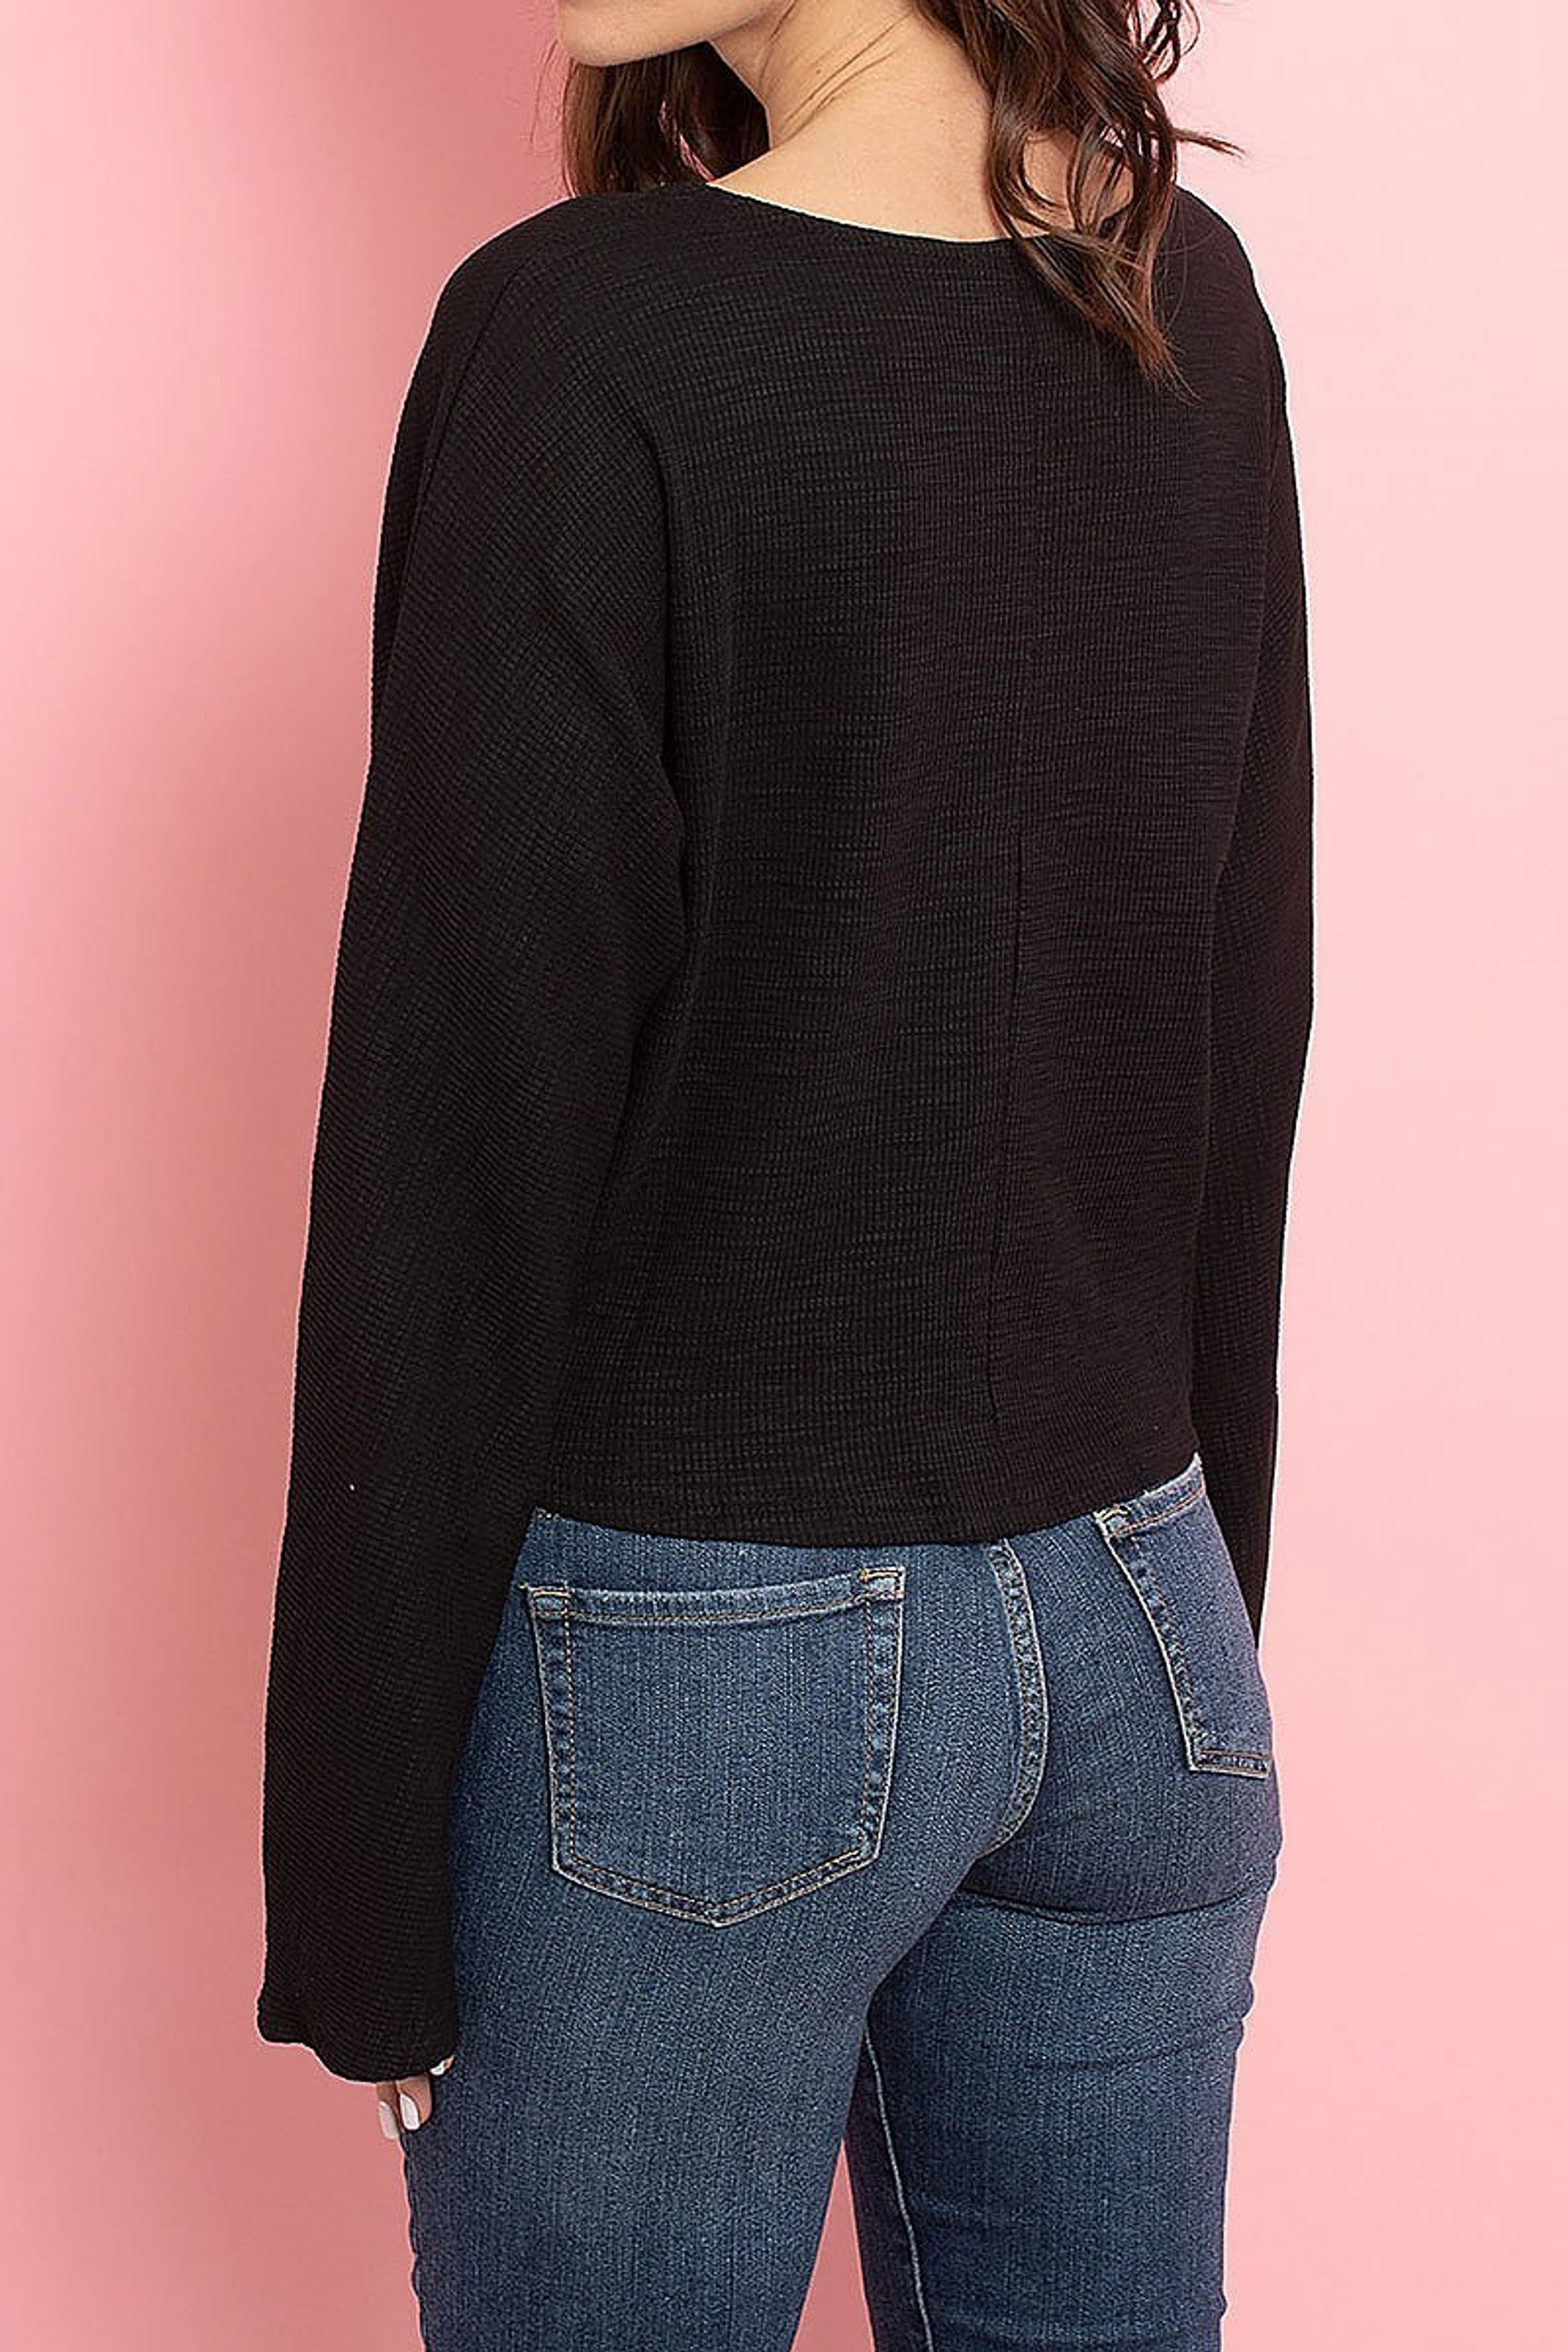 Black Cropped Waist Tie Hem Long Sleeve Cotton V-Neck Top